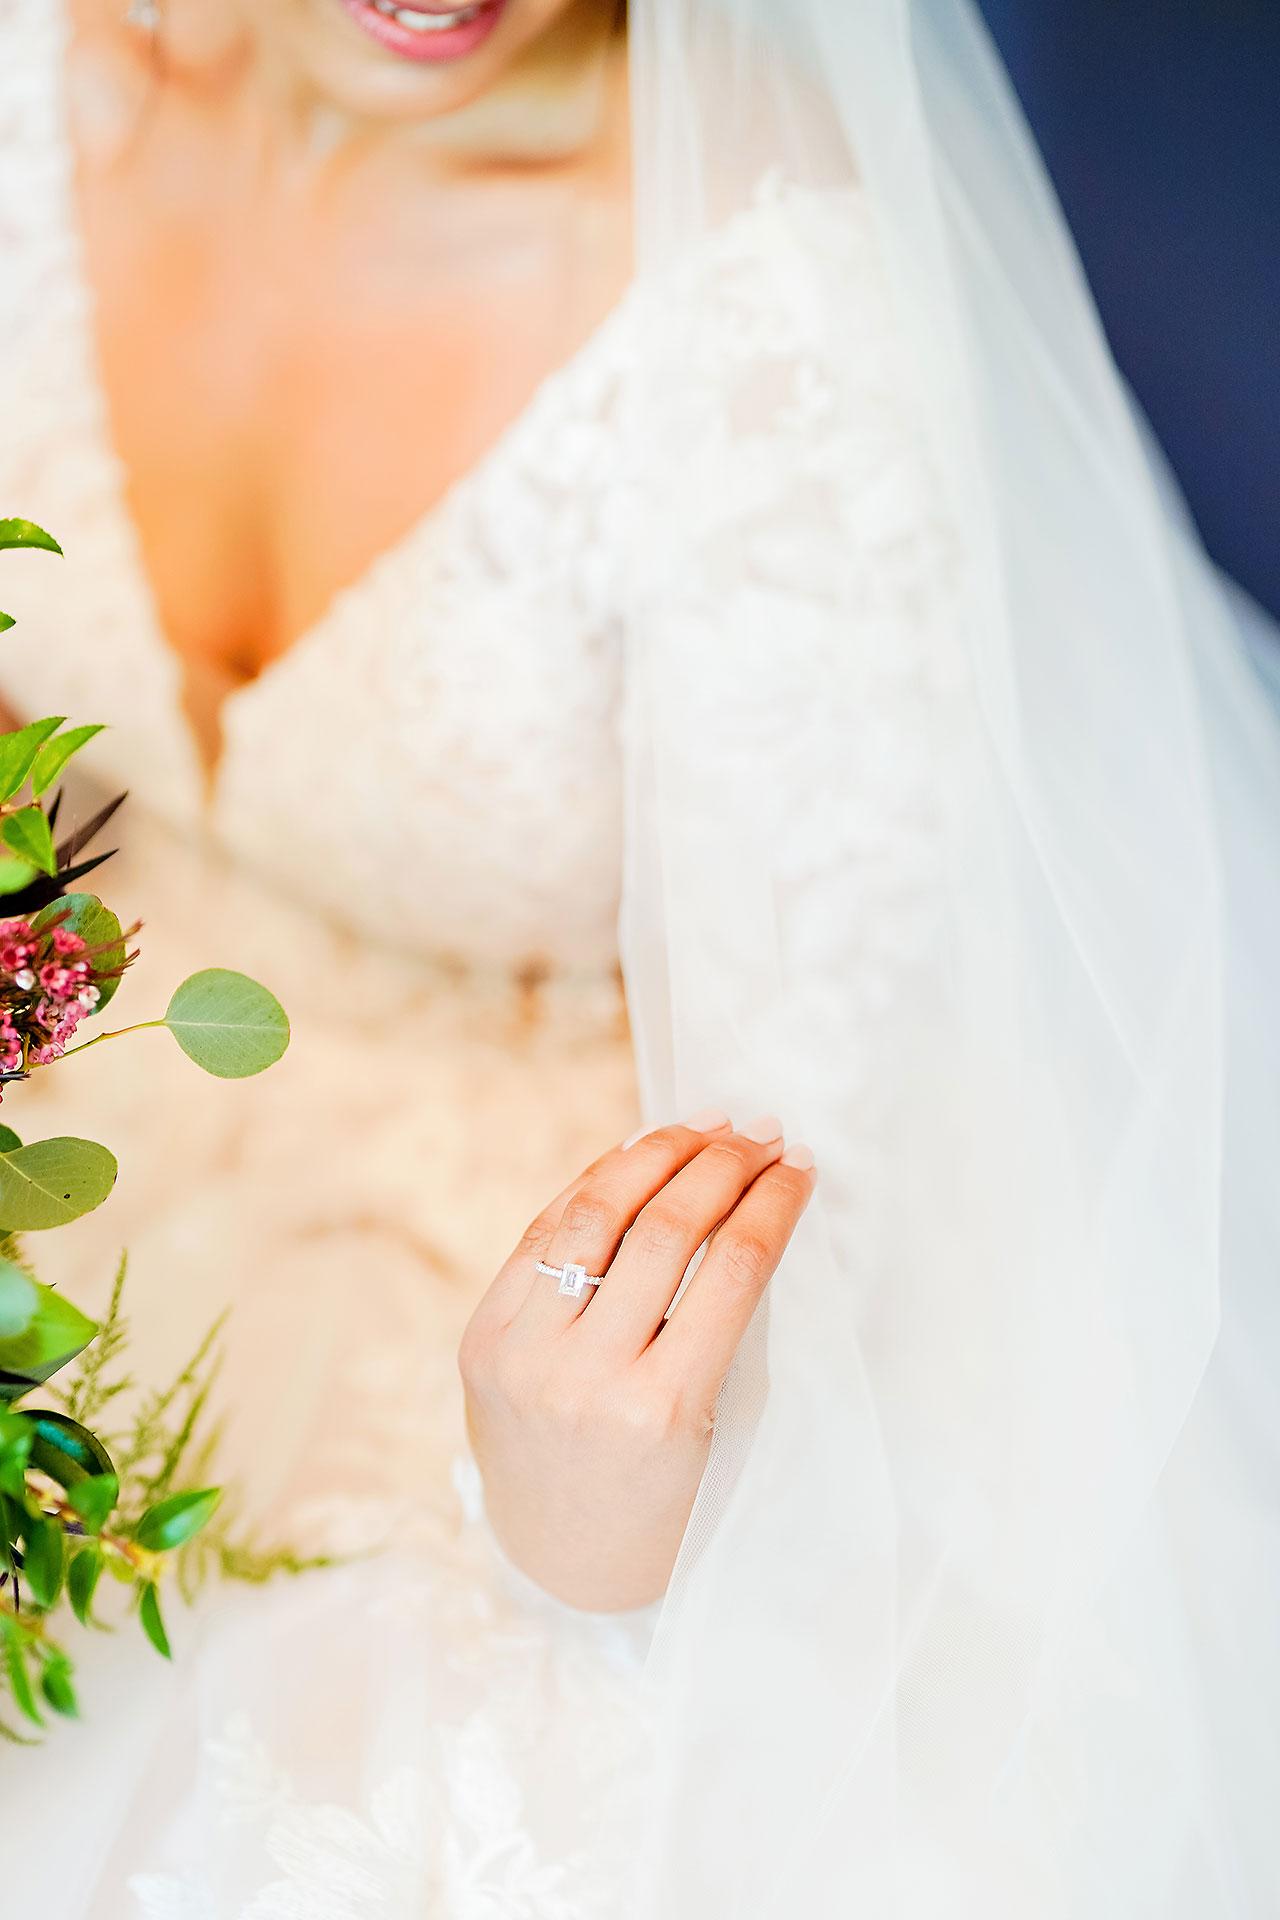 Nadia Parker Black Iris Estate Carmel Indiana Wedding May 2021 040